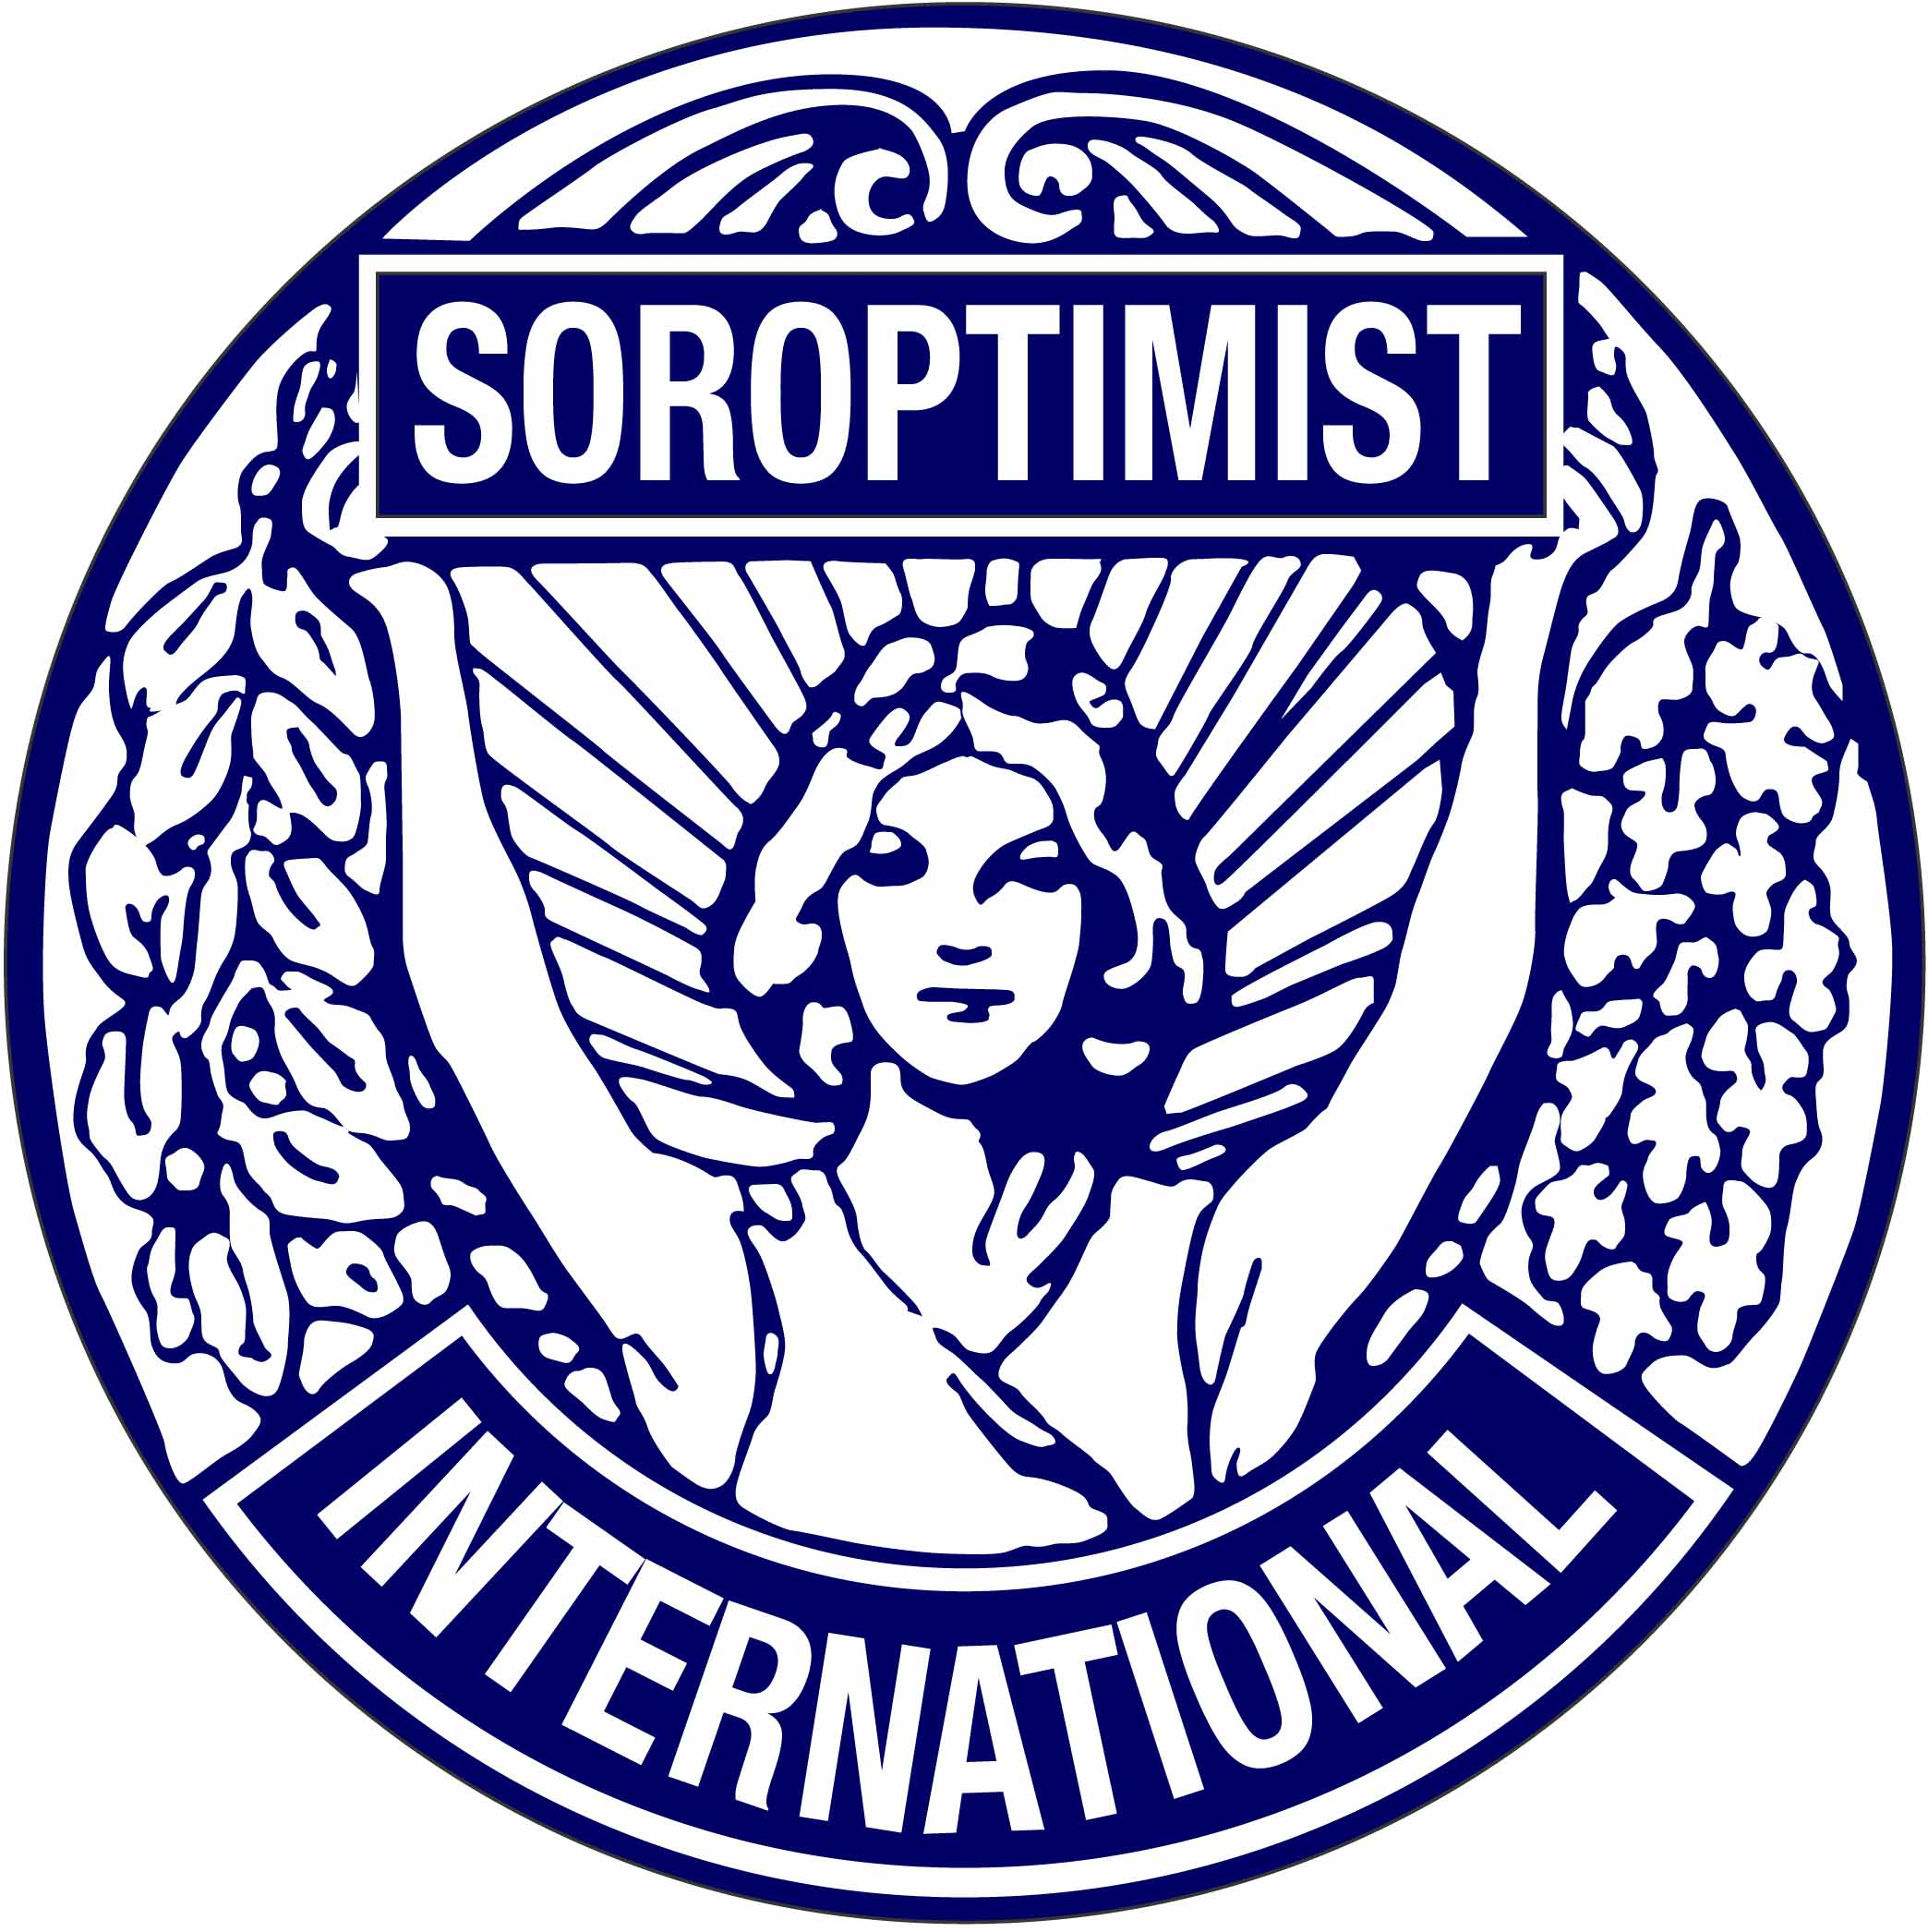 Soroptimist International (SI) Mainz